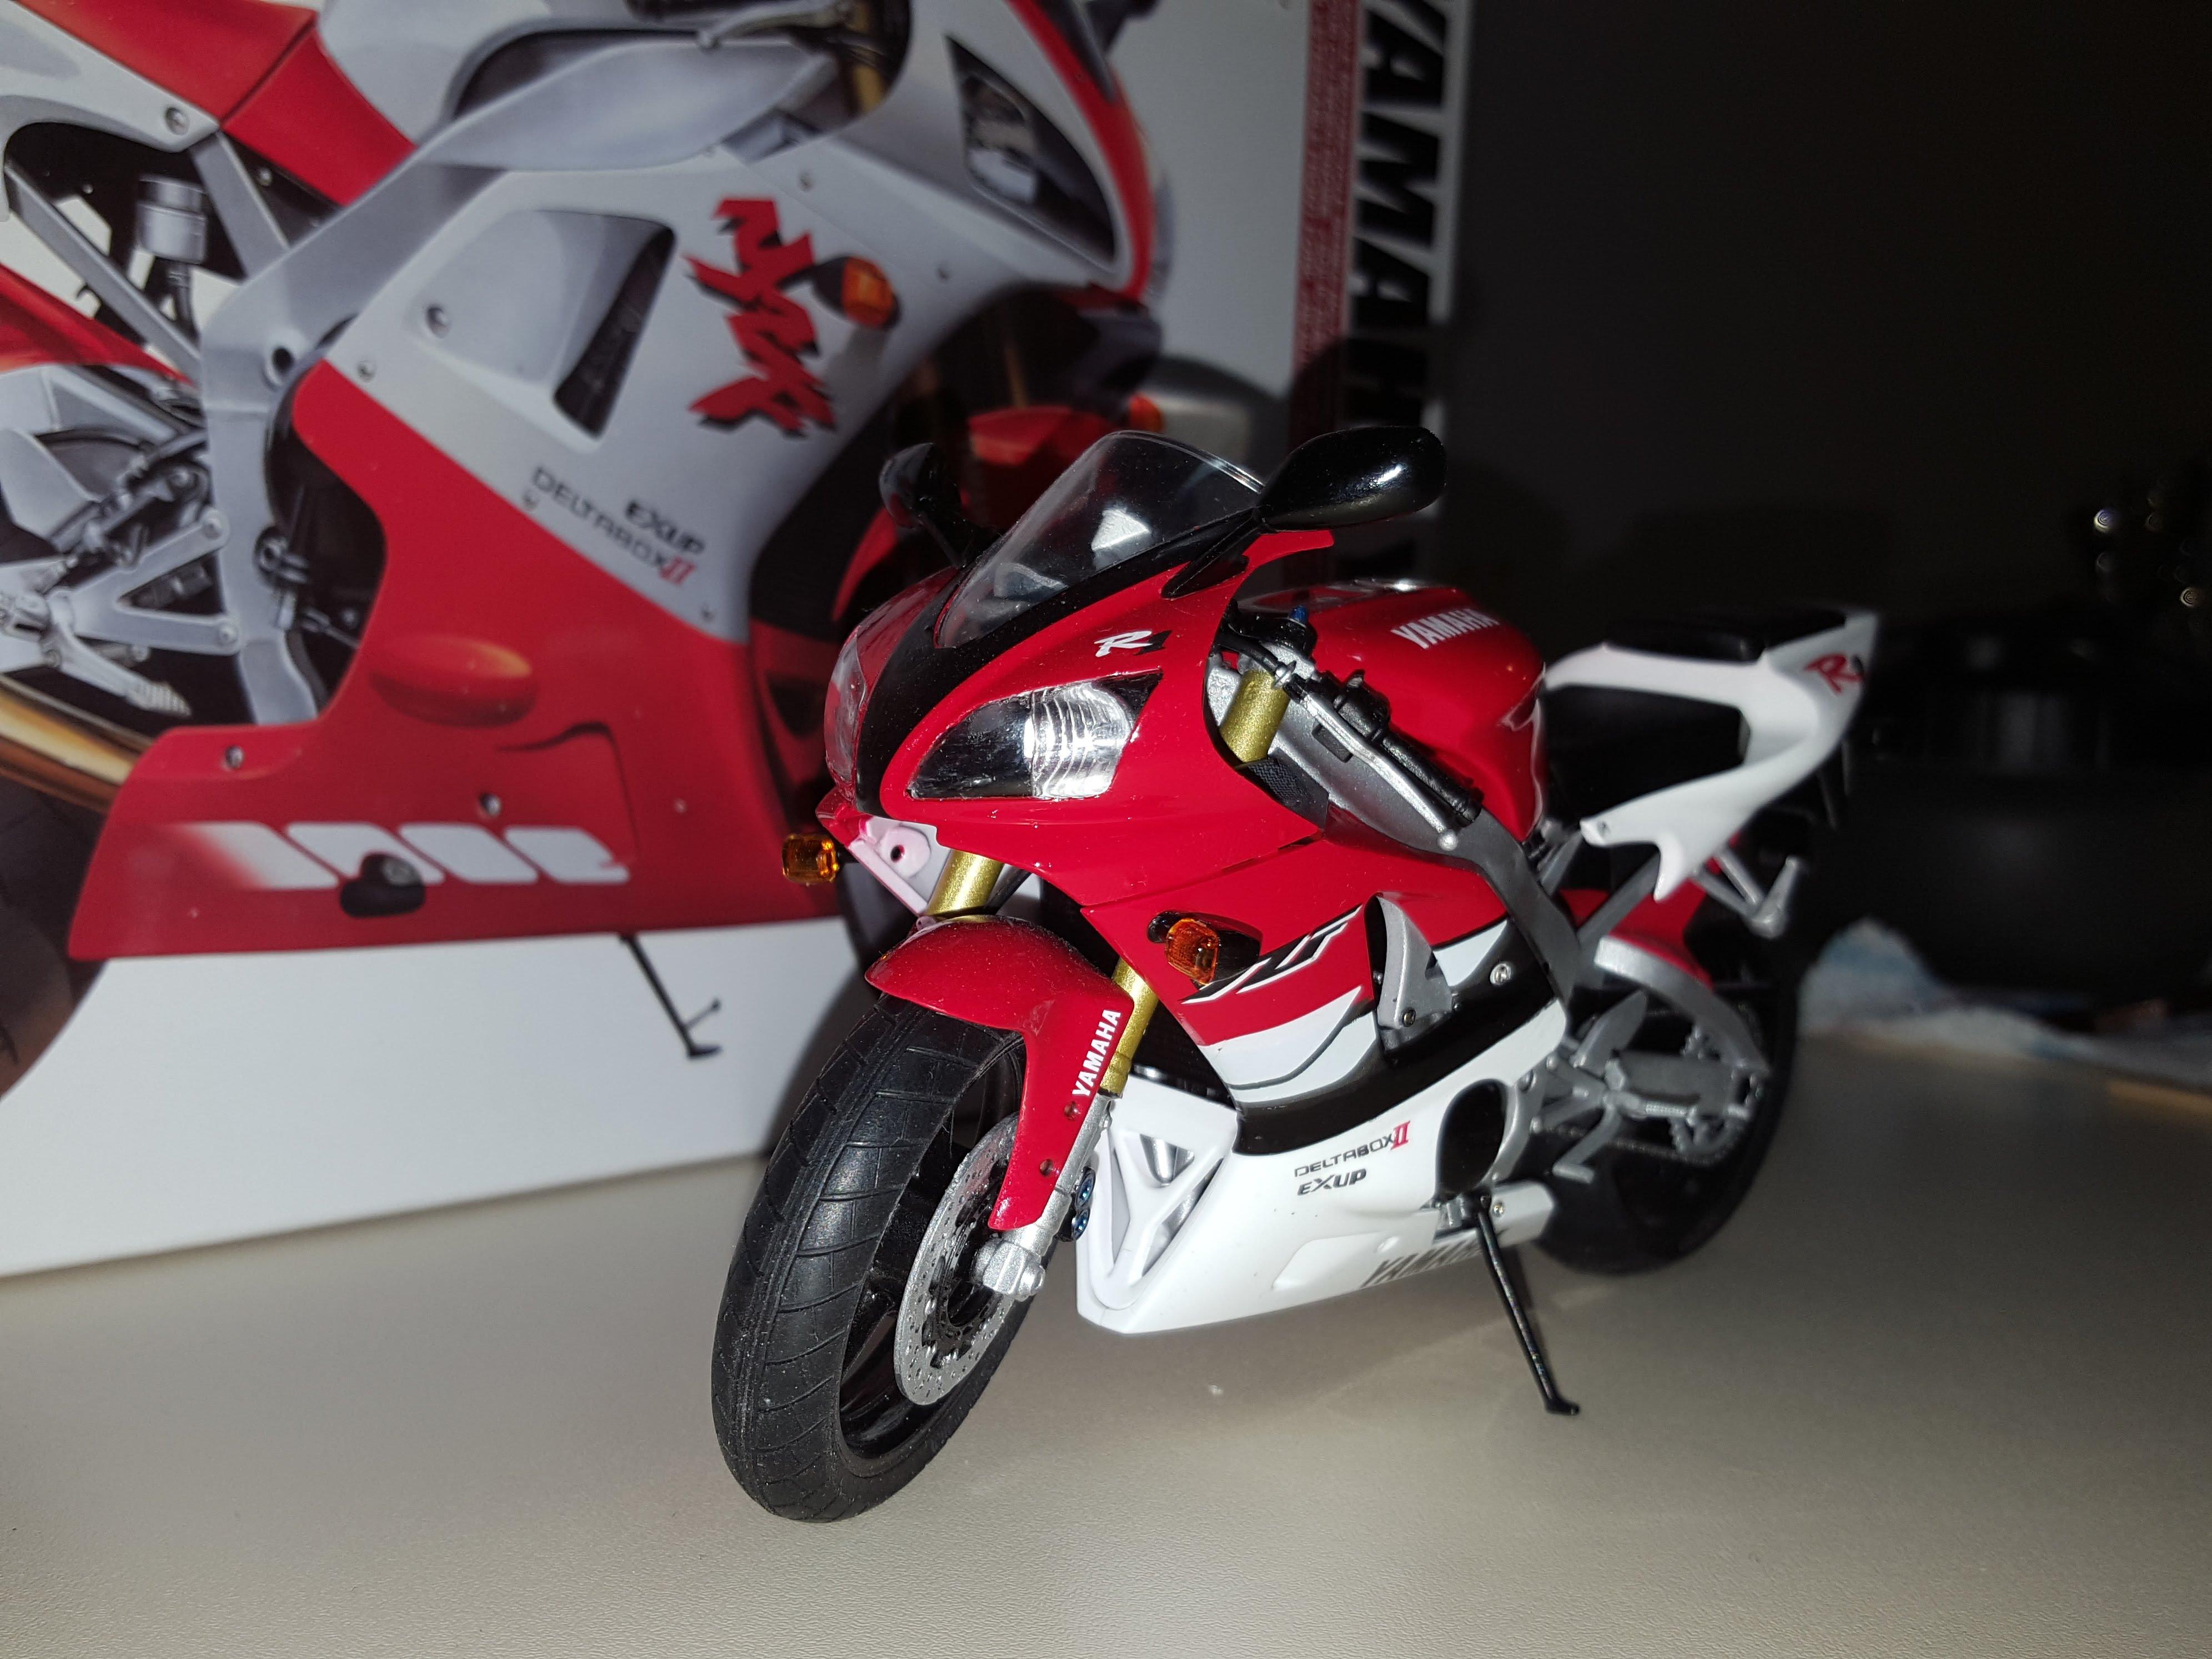 Yamaha YZF-R1 front